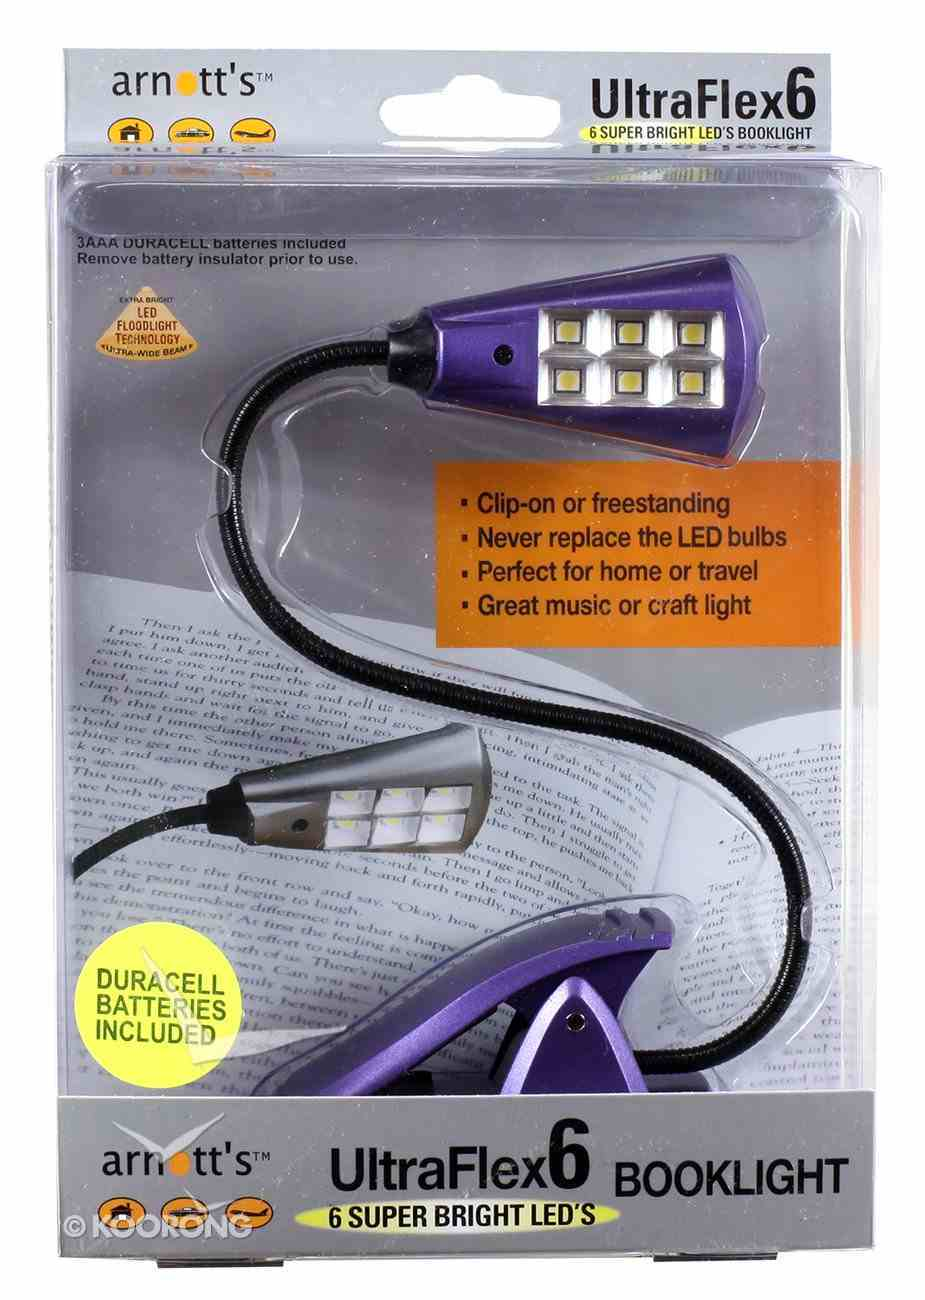 Ultraflex6 Booklight With 6 Super Bright Led's Purple Novelty